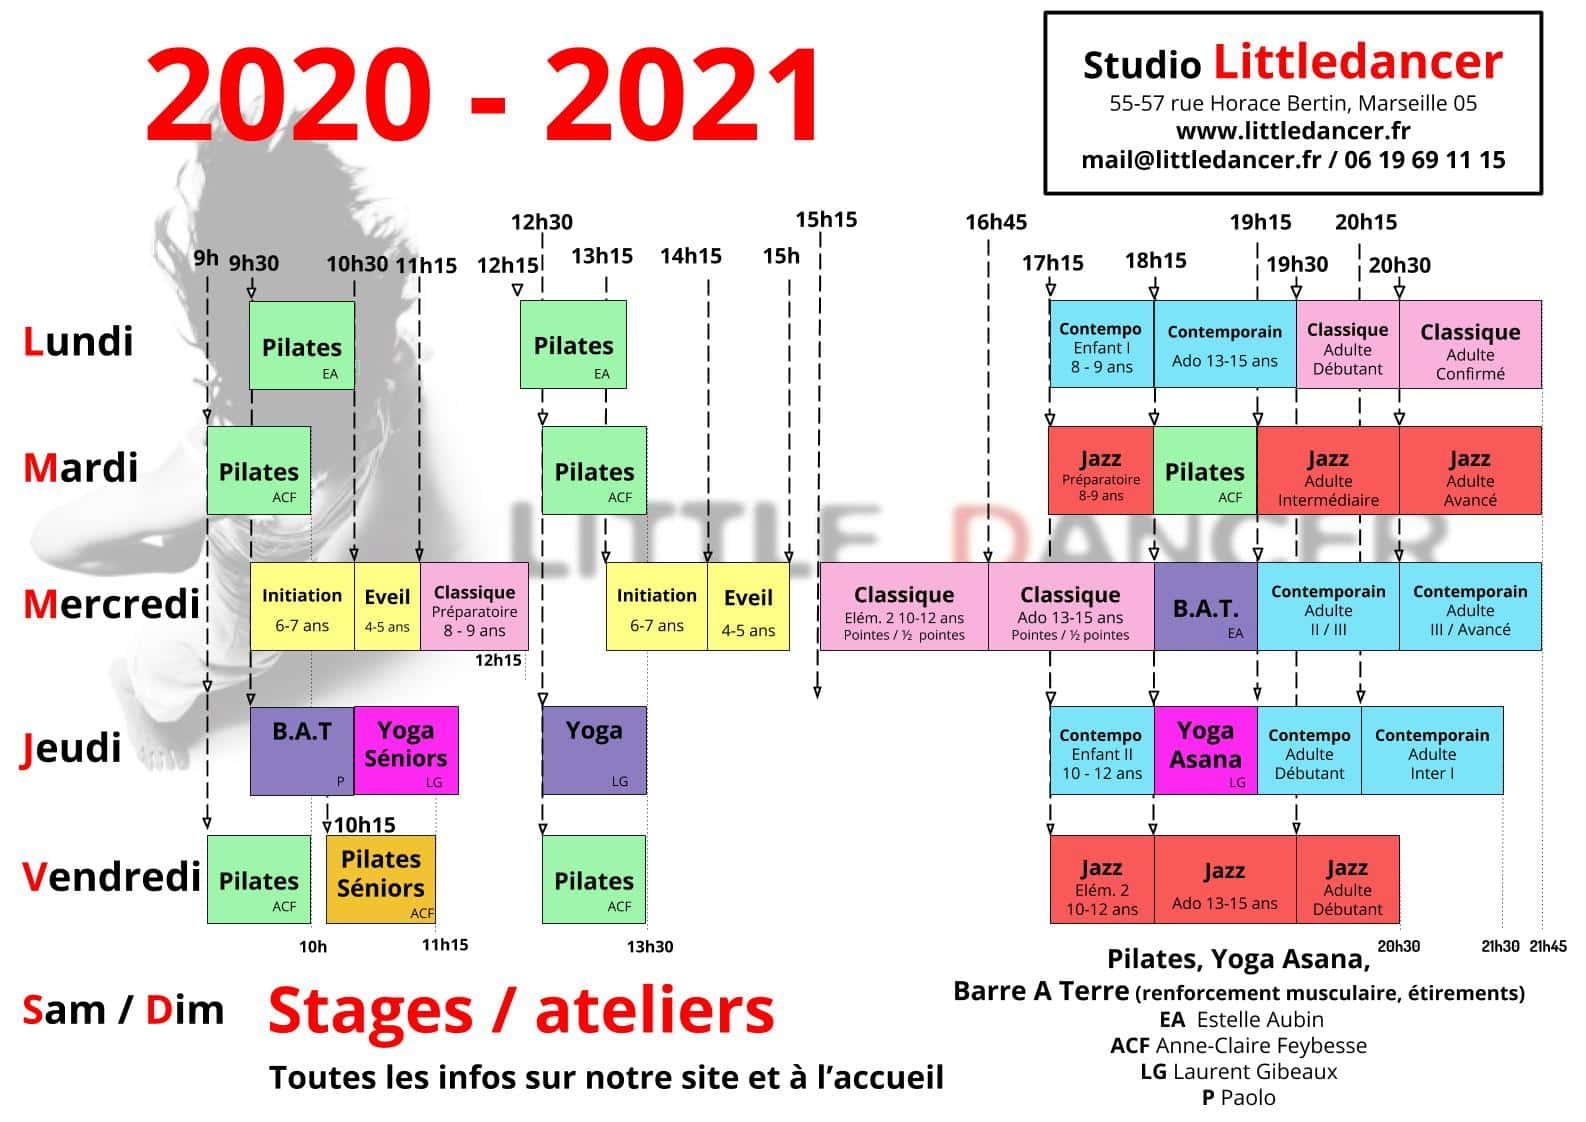 Planning Littledancer 2020 - 2021